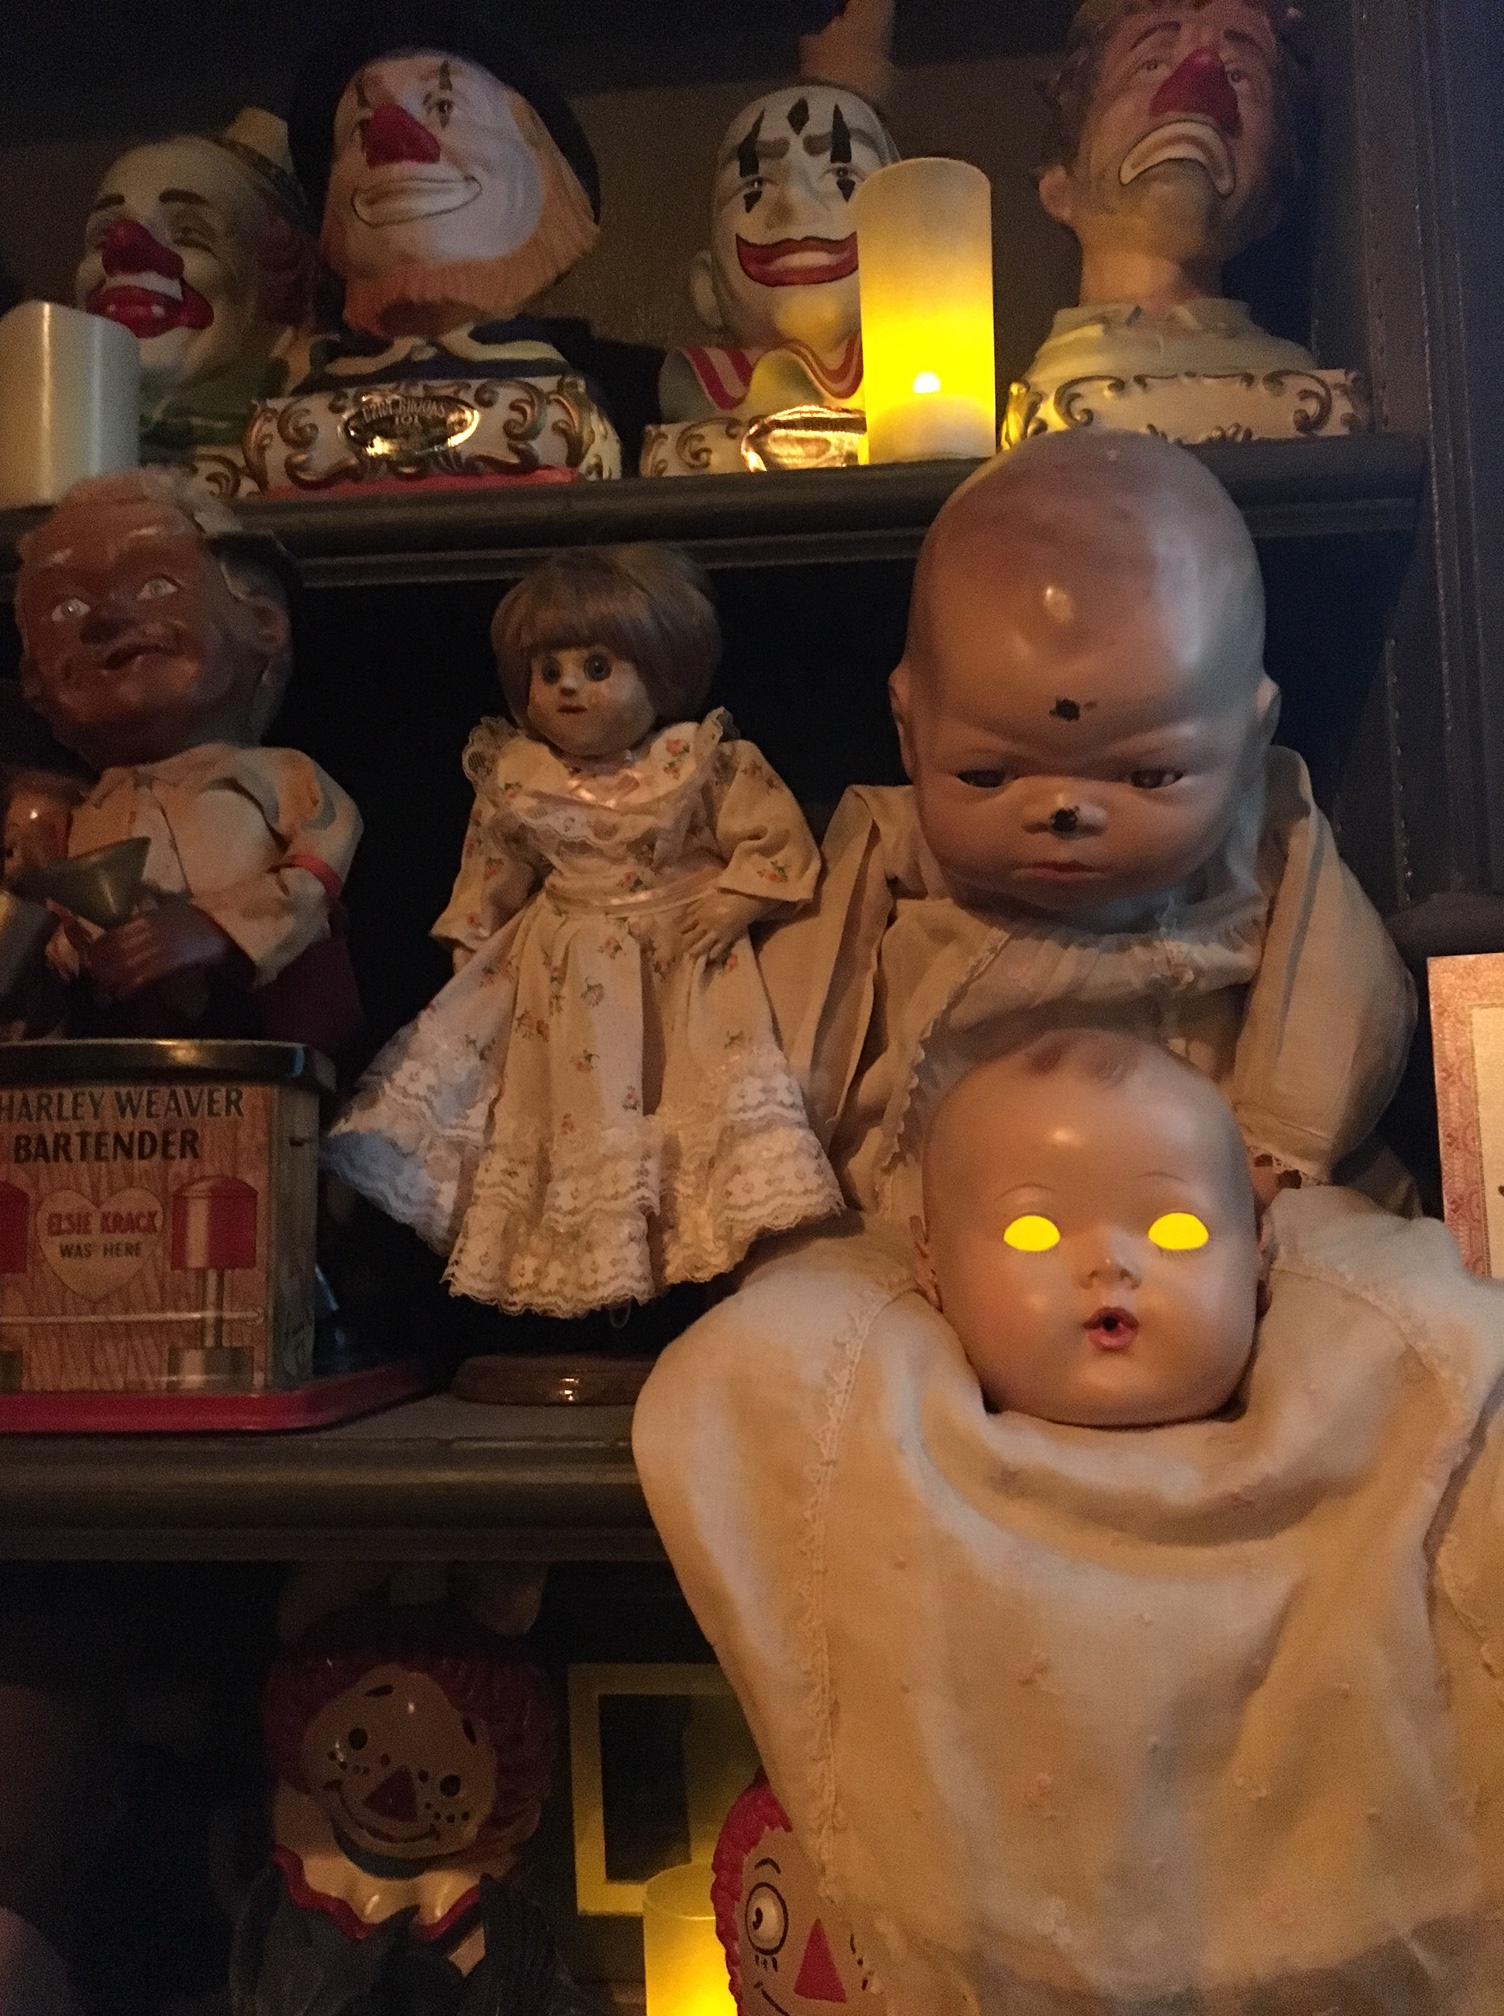 Haunted House Dolls